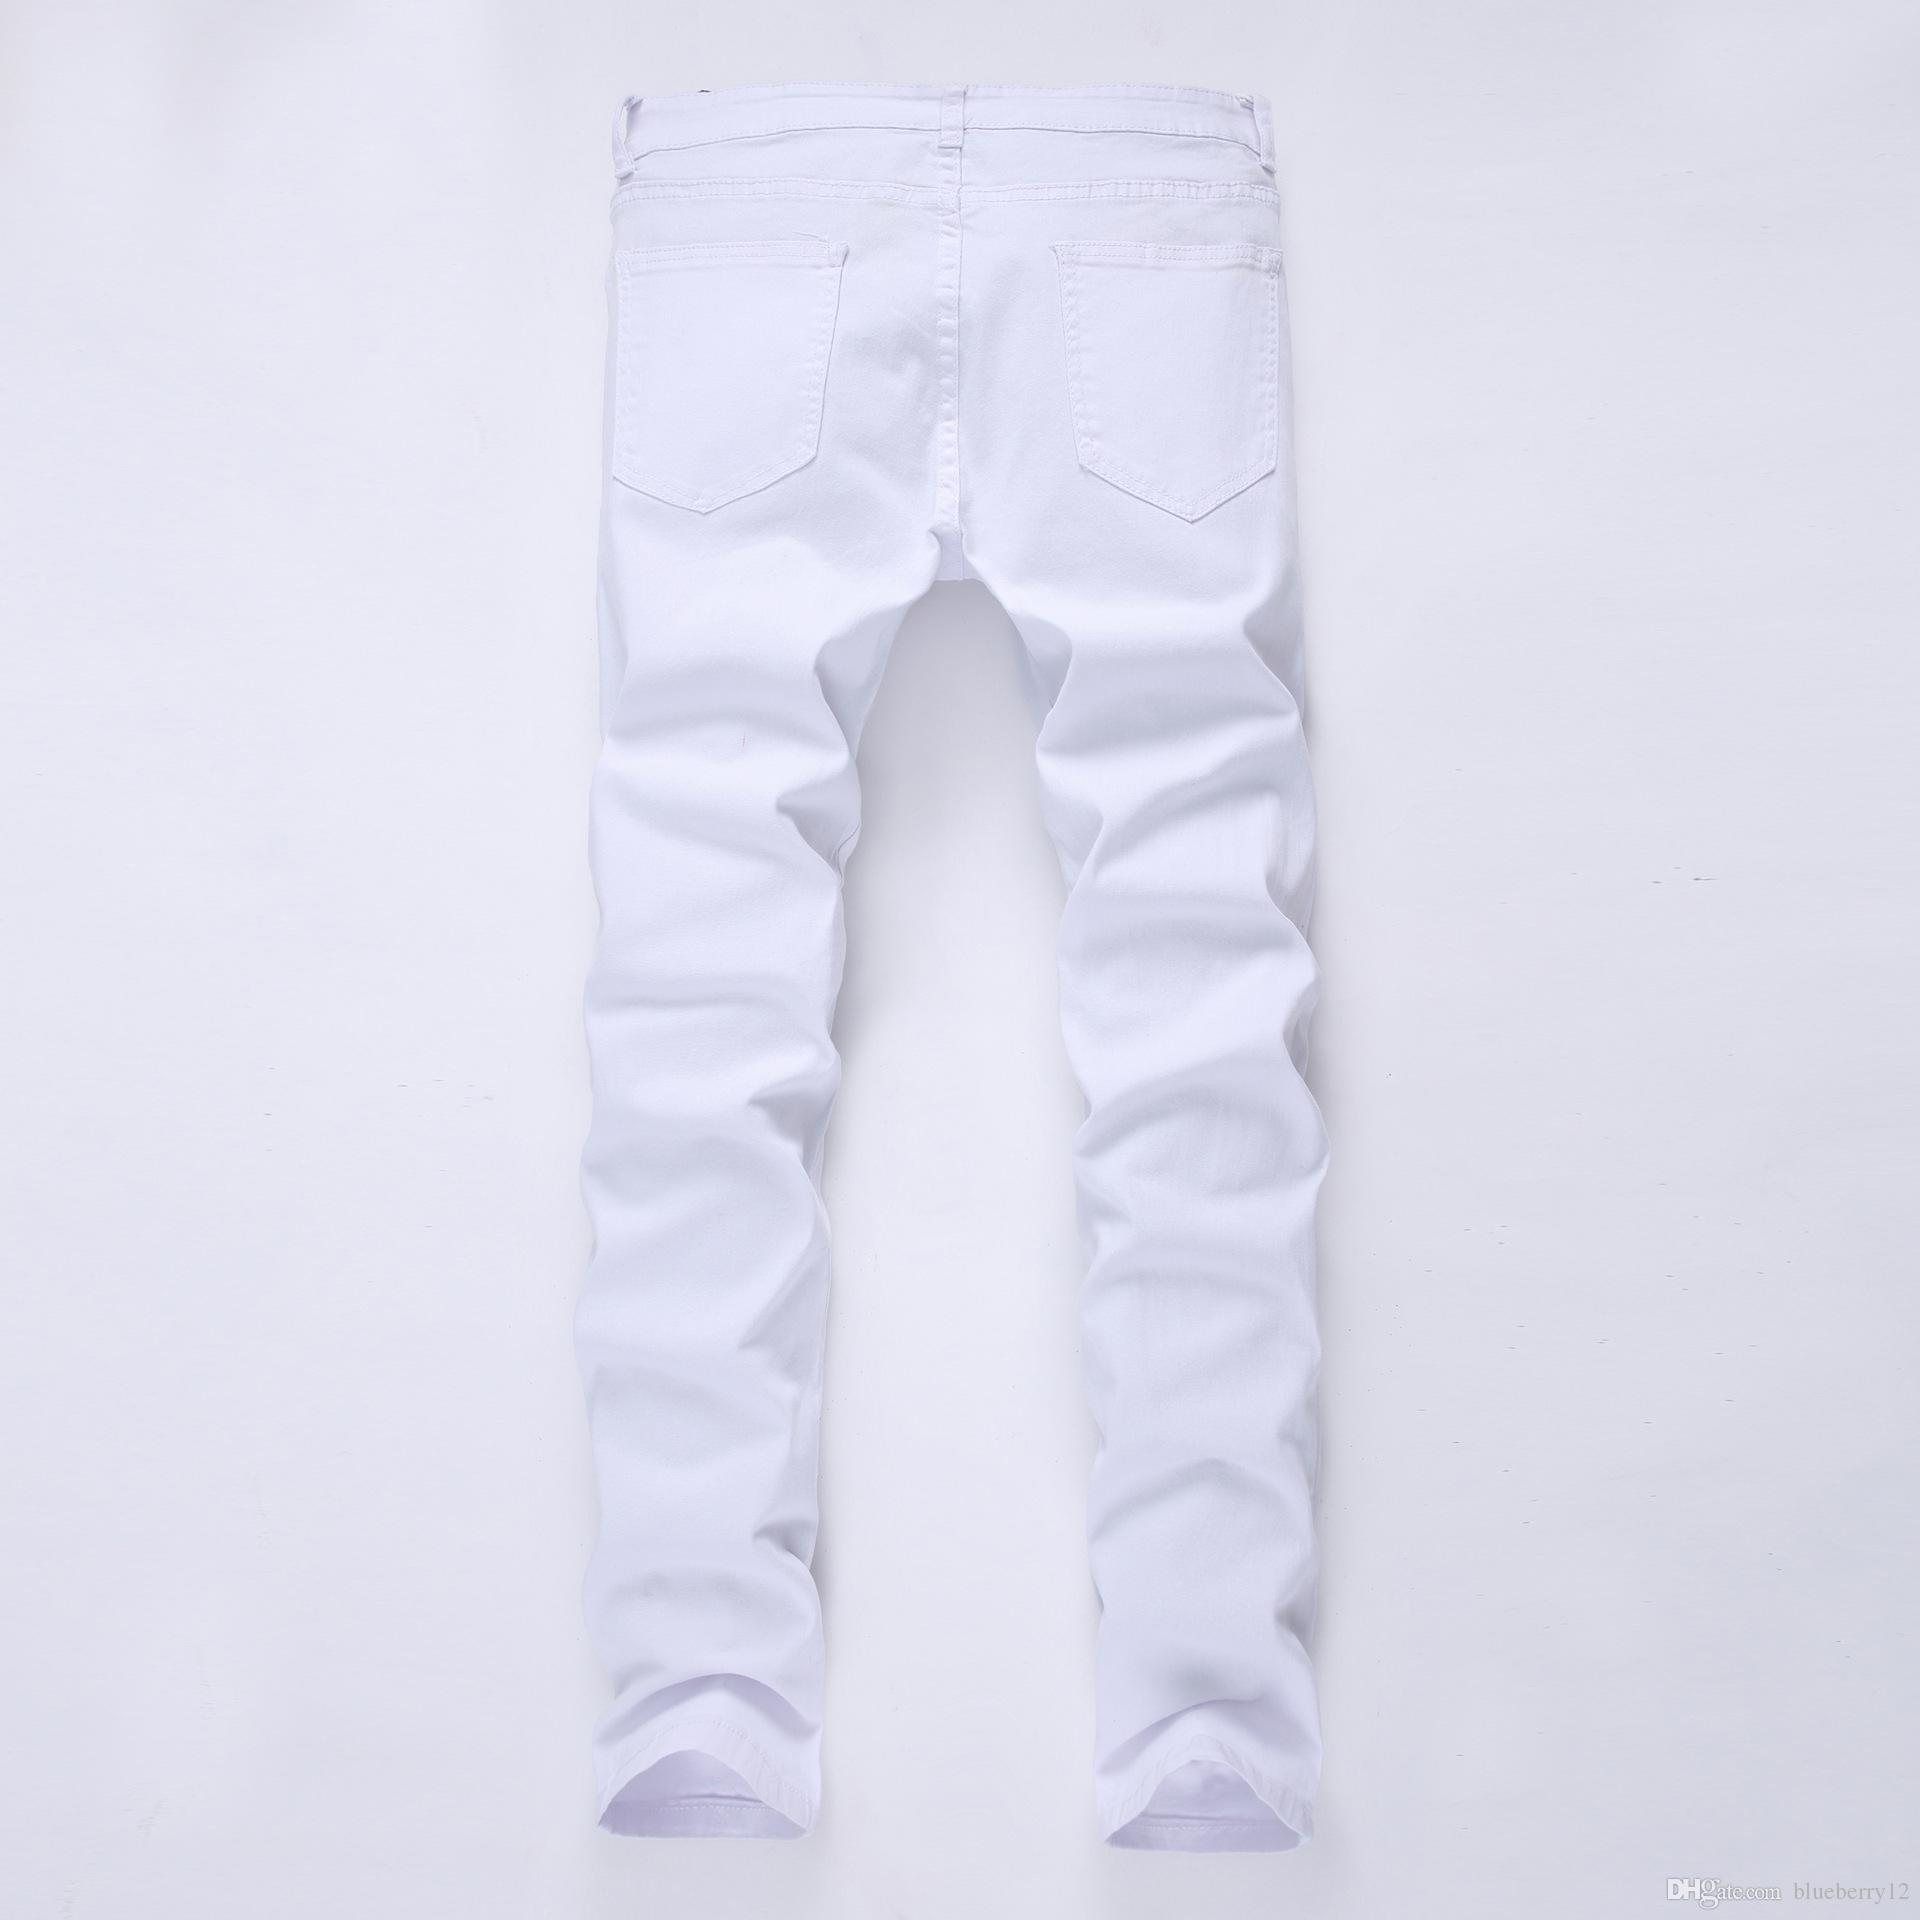 Pantaloni da uomo alla moda in jeans slim fit aderenti Pantaloni in denim distrutti strappati skinny strappati Pantaloni hiphop lavati neri